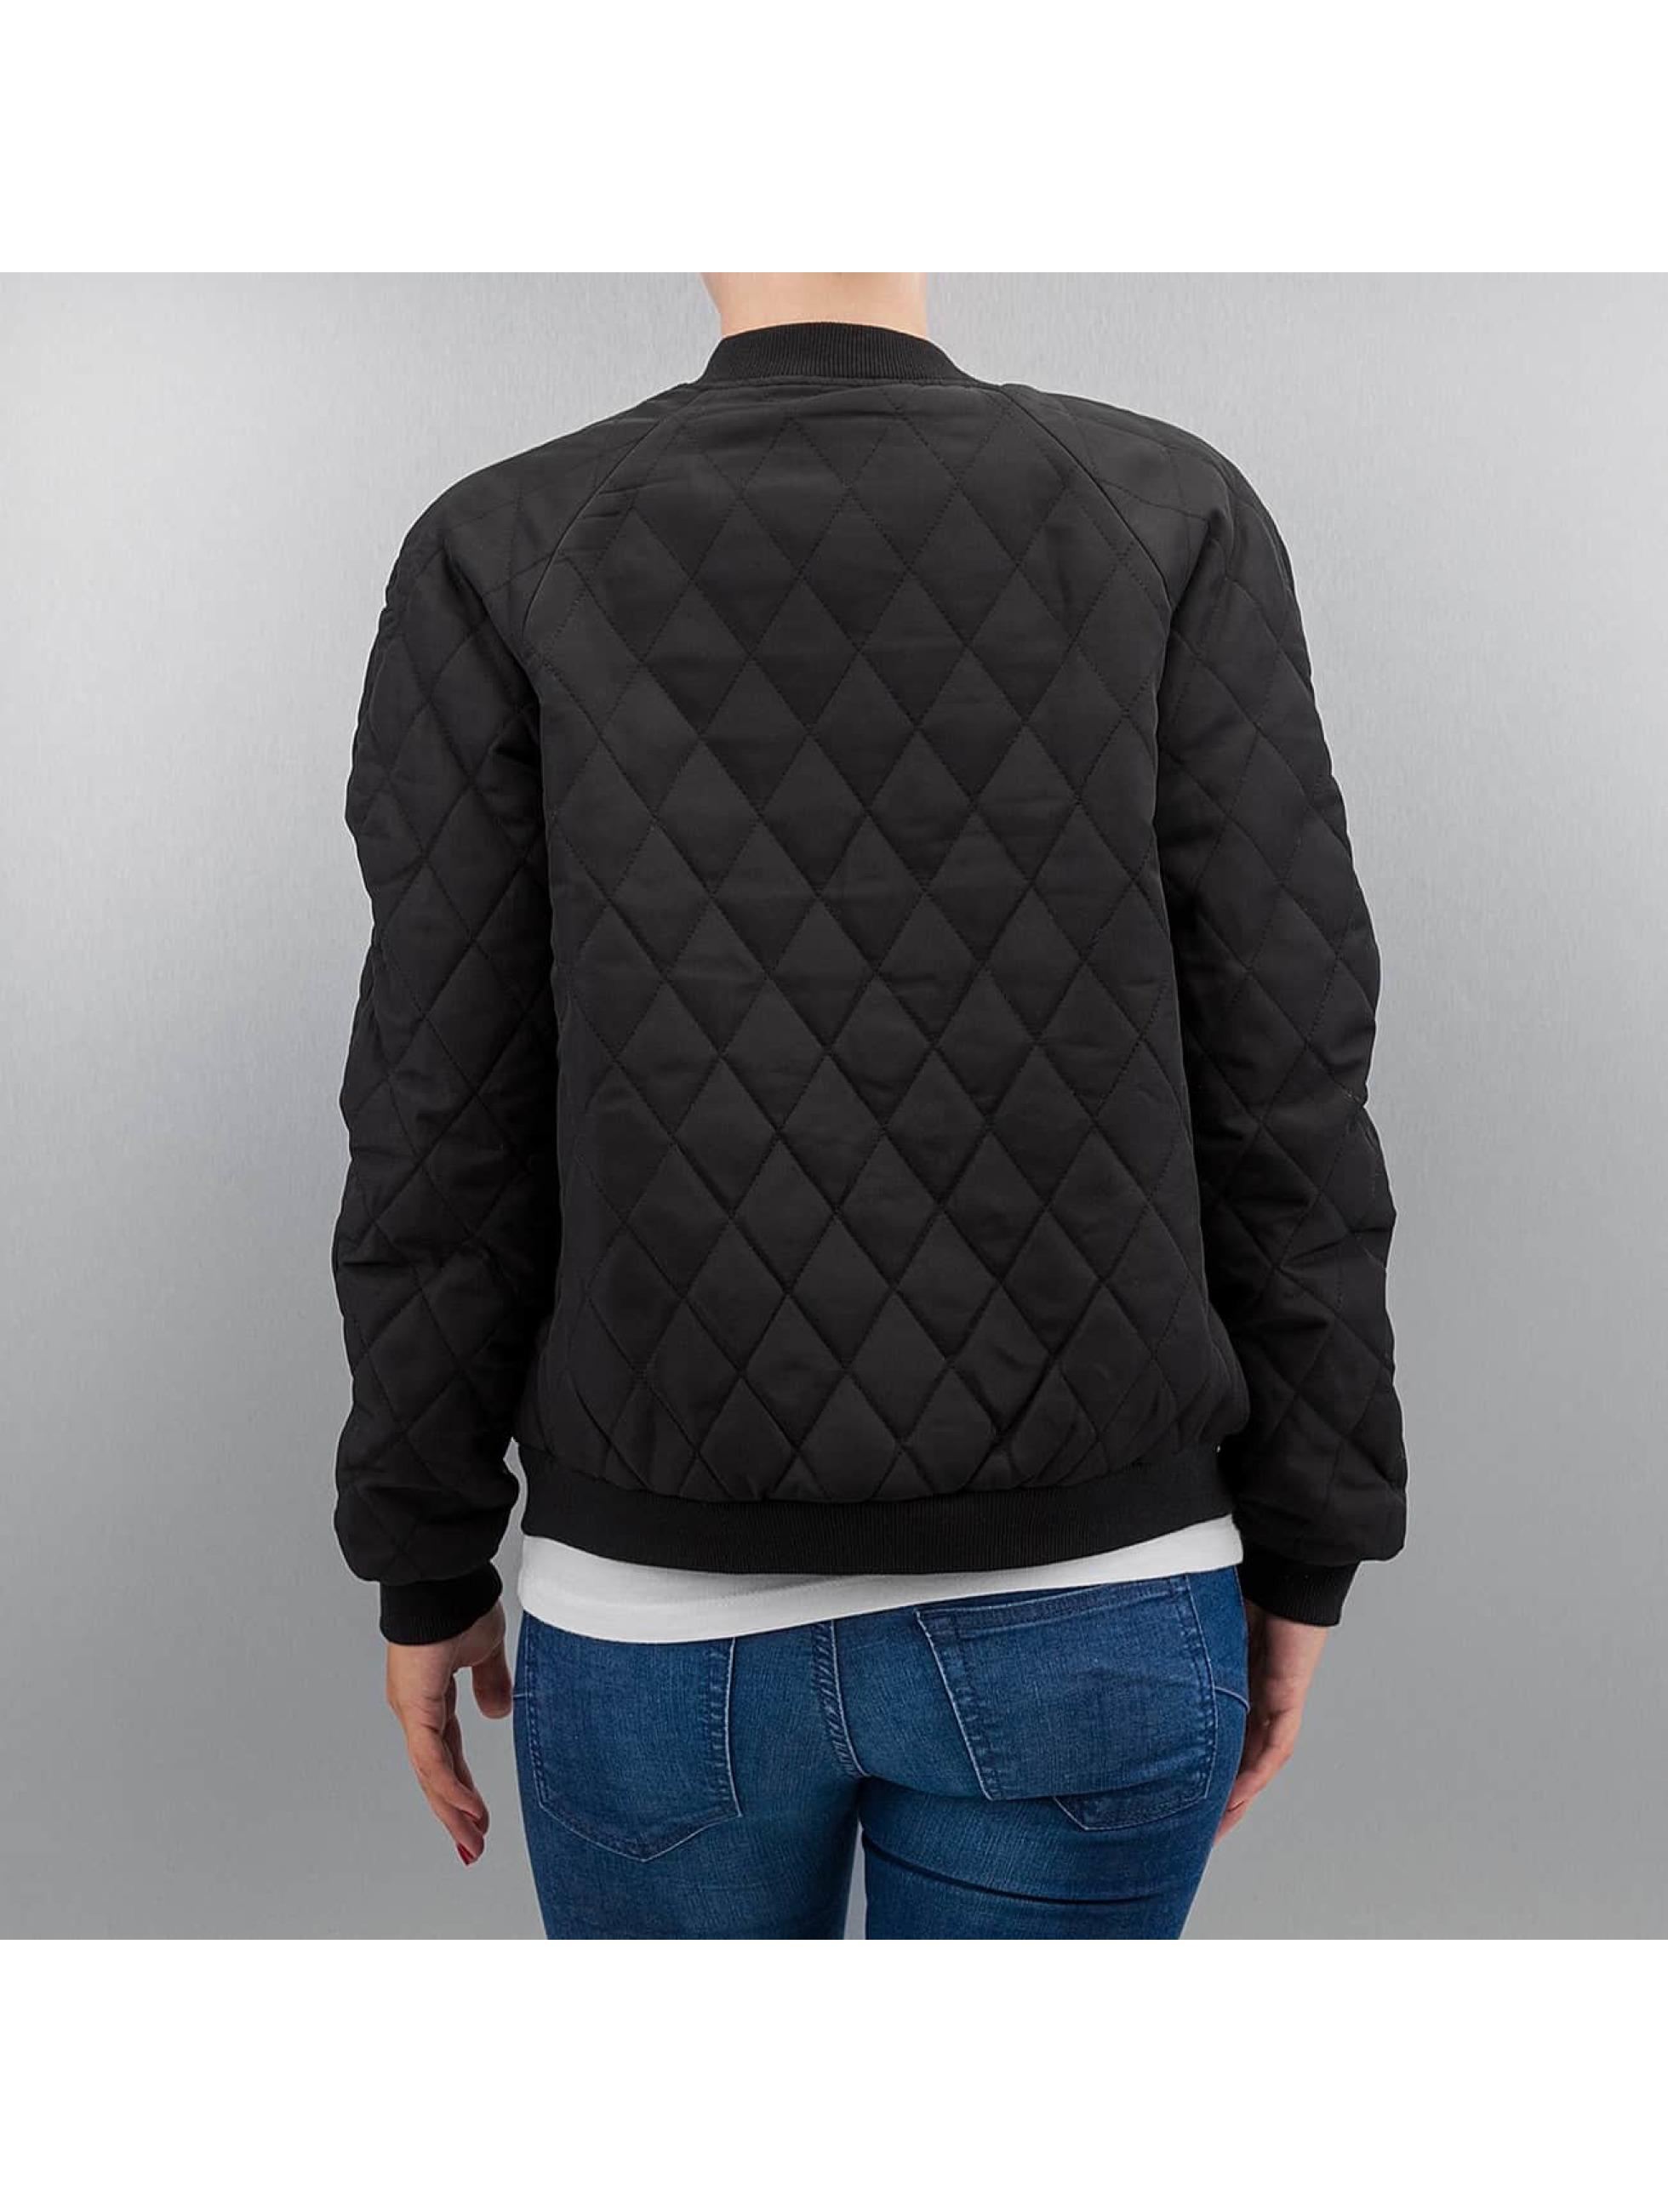 Pieces Куртка-бомбардир pcDarling черный